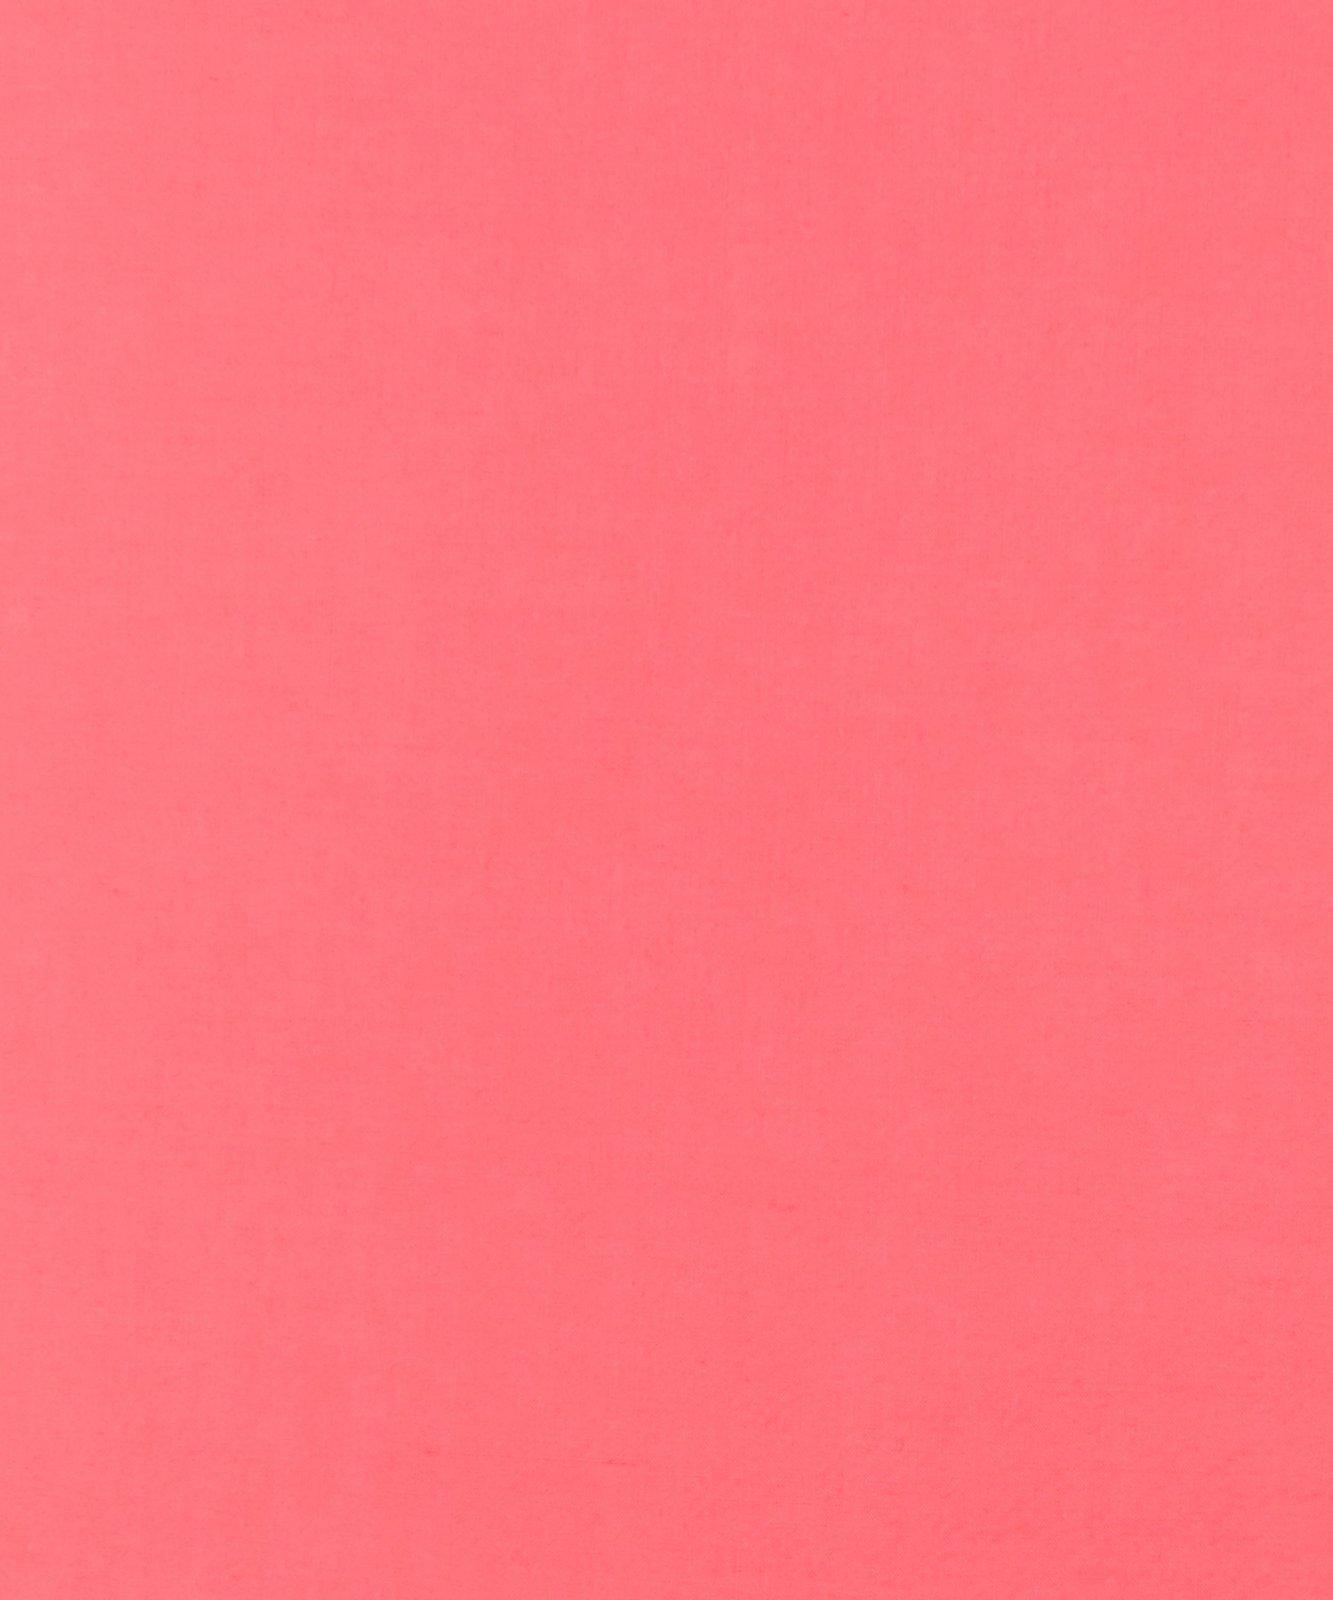 Flamingo Liberty of London Tana Lawn Fabric